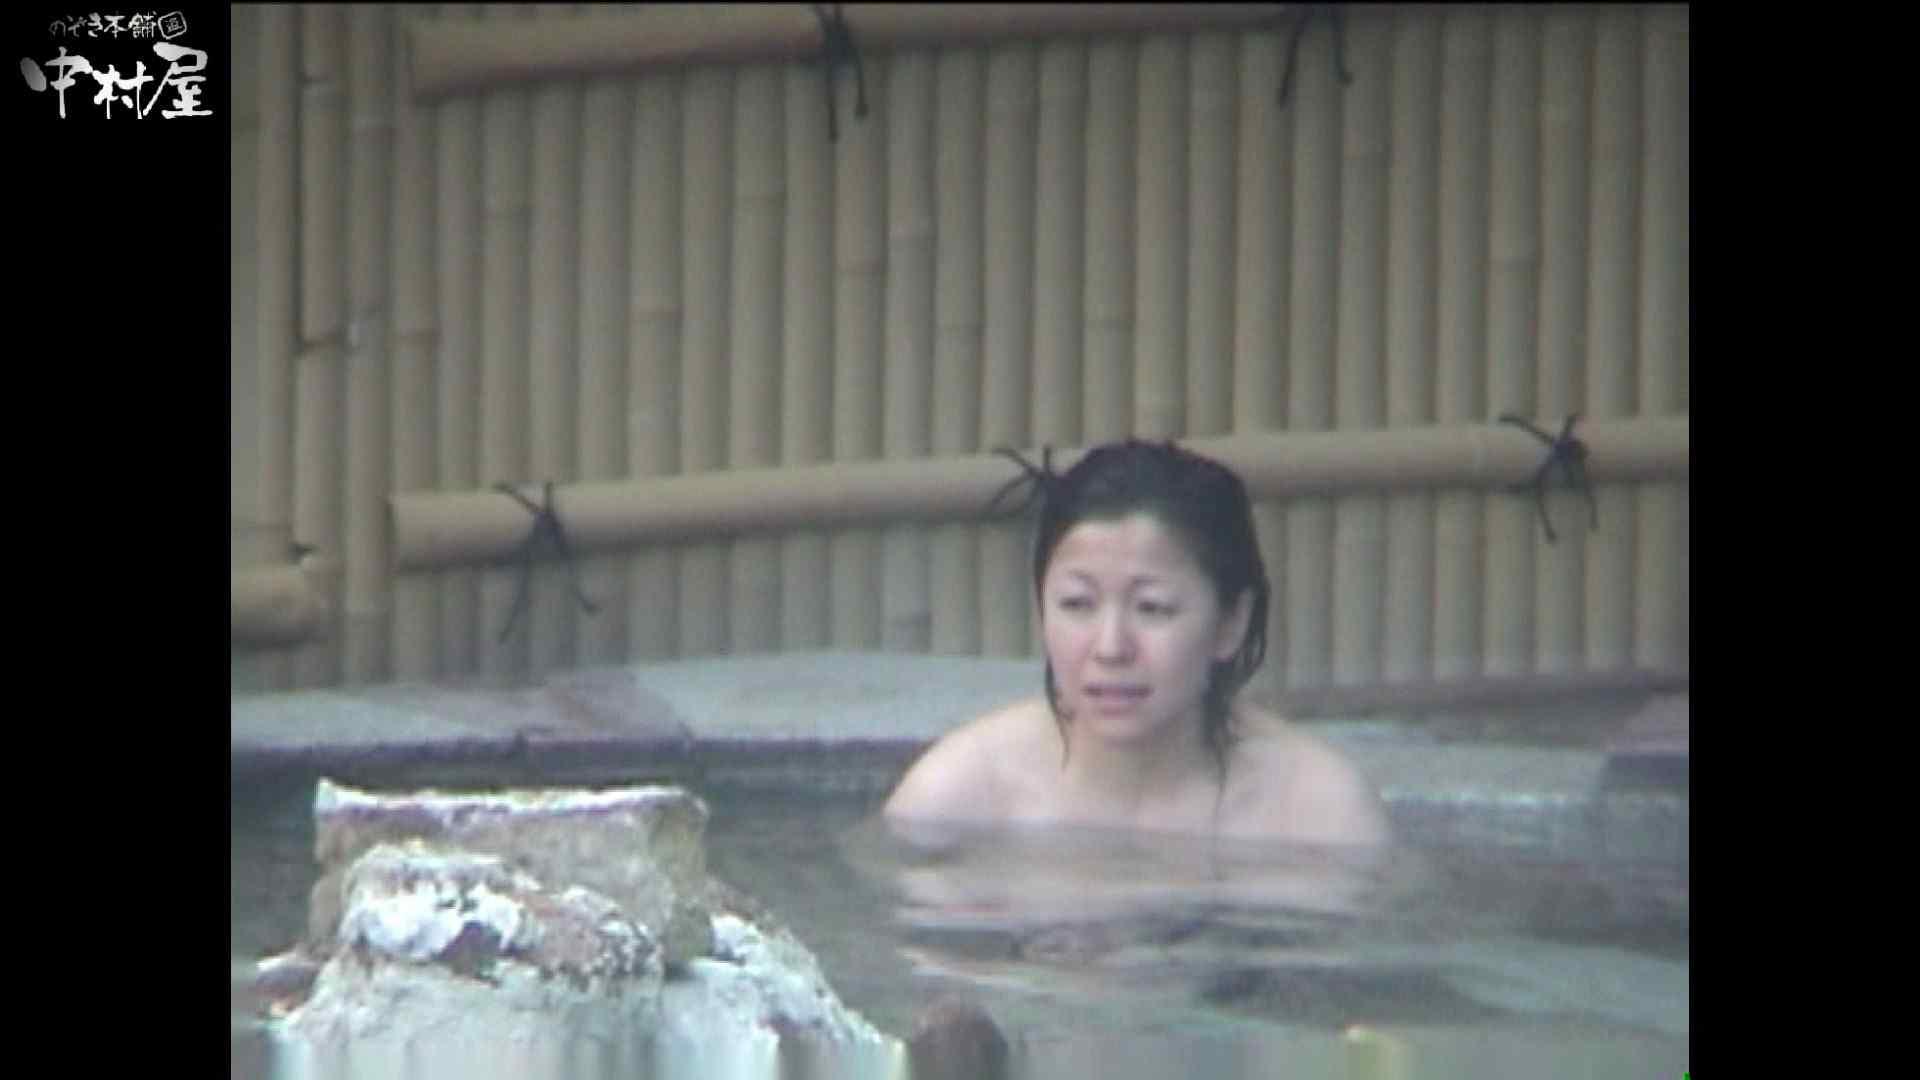 Aquaな露天風呂Vol.986 露天 | OLのプライベート  13pic 1